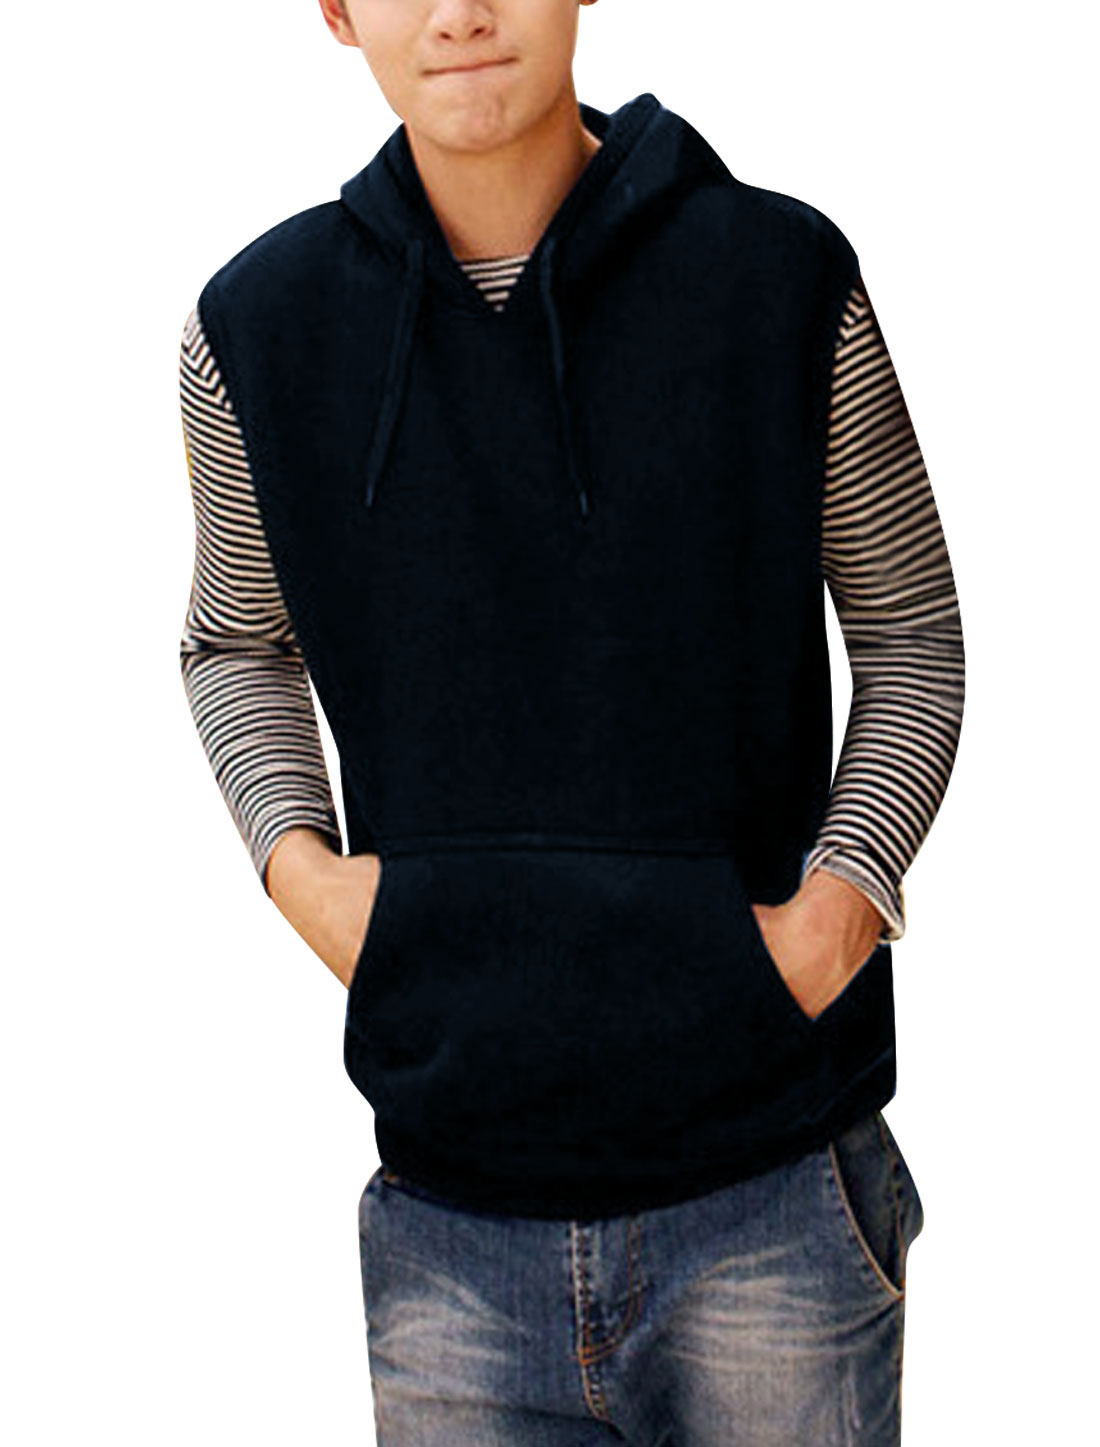 Men Pullover Sleeveless Casual Hooded Vest Navy Blue M